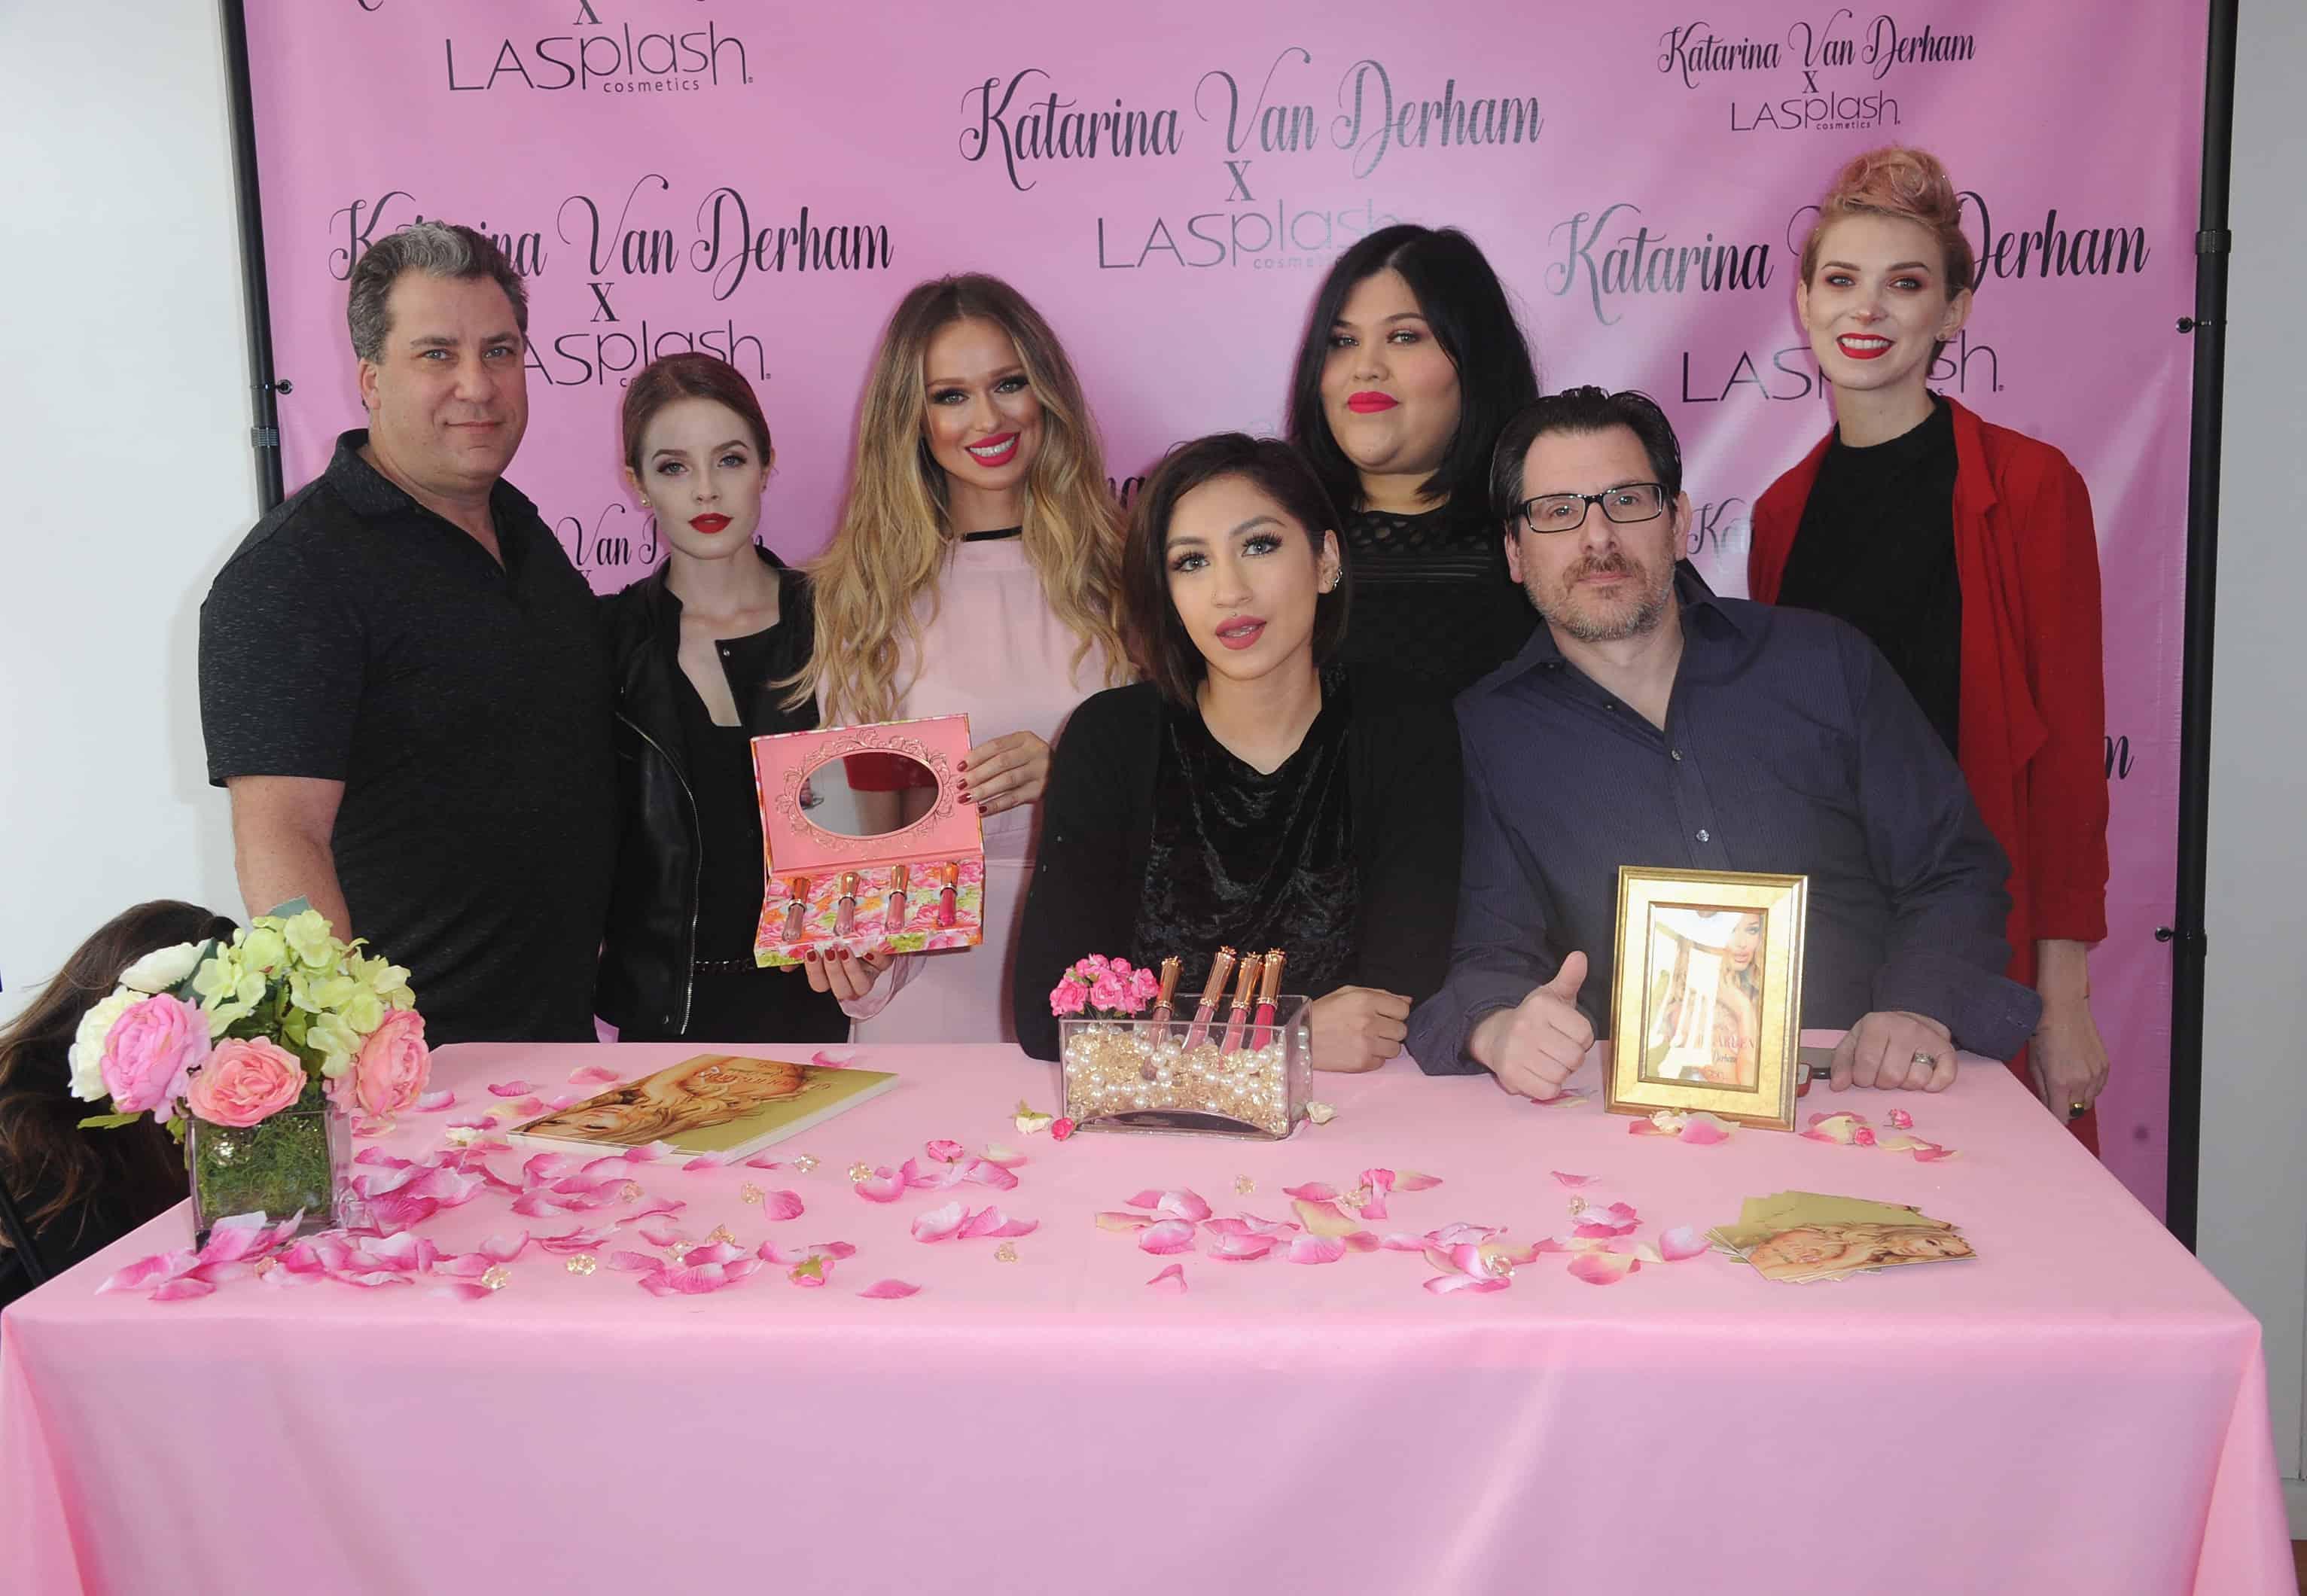 Meet And Greet For Katarina Van Derham's New Lipstick Launch